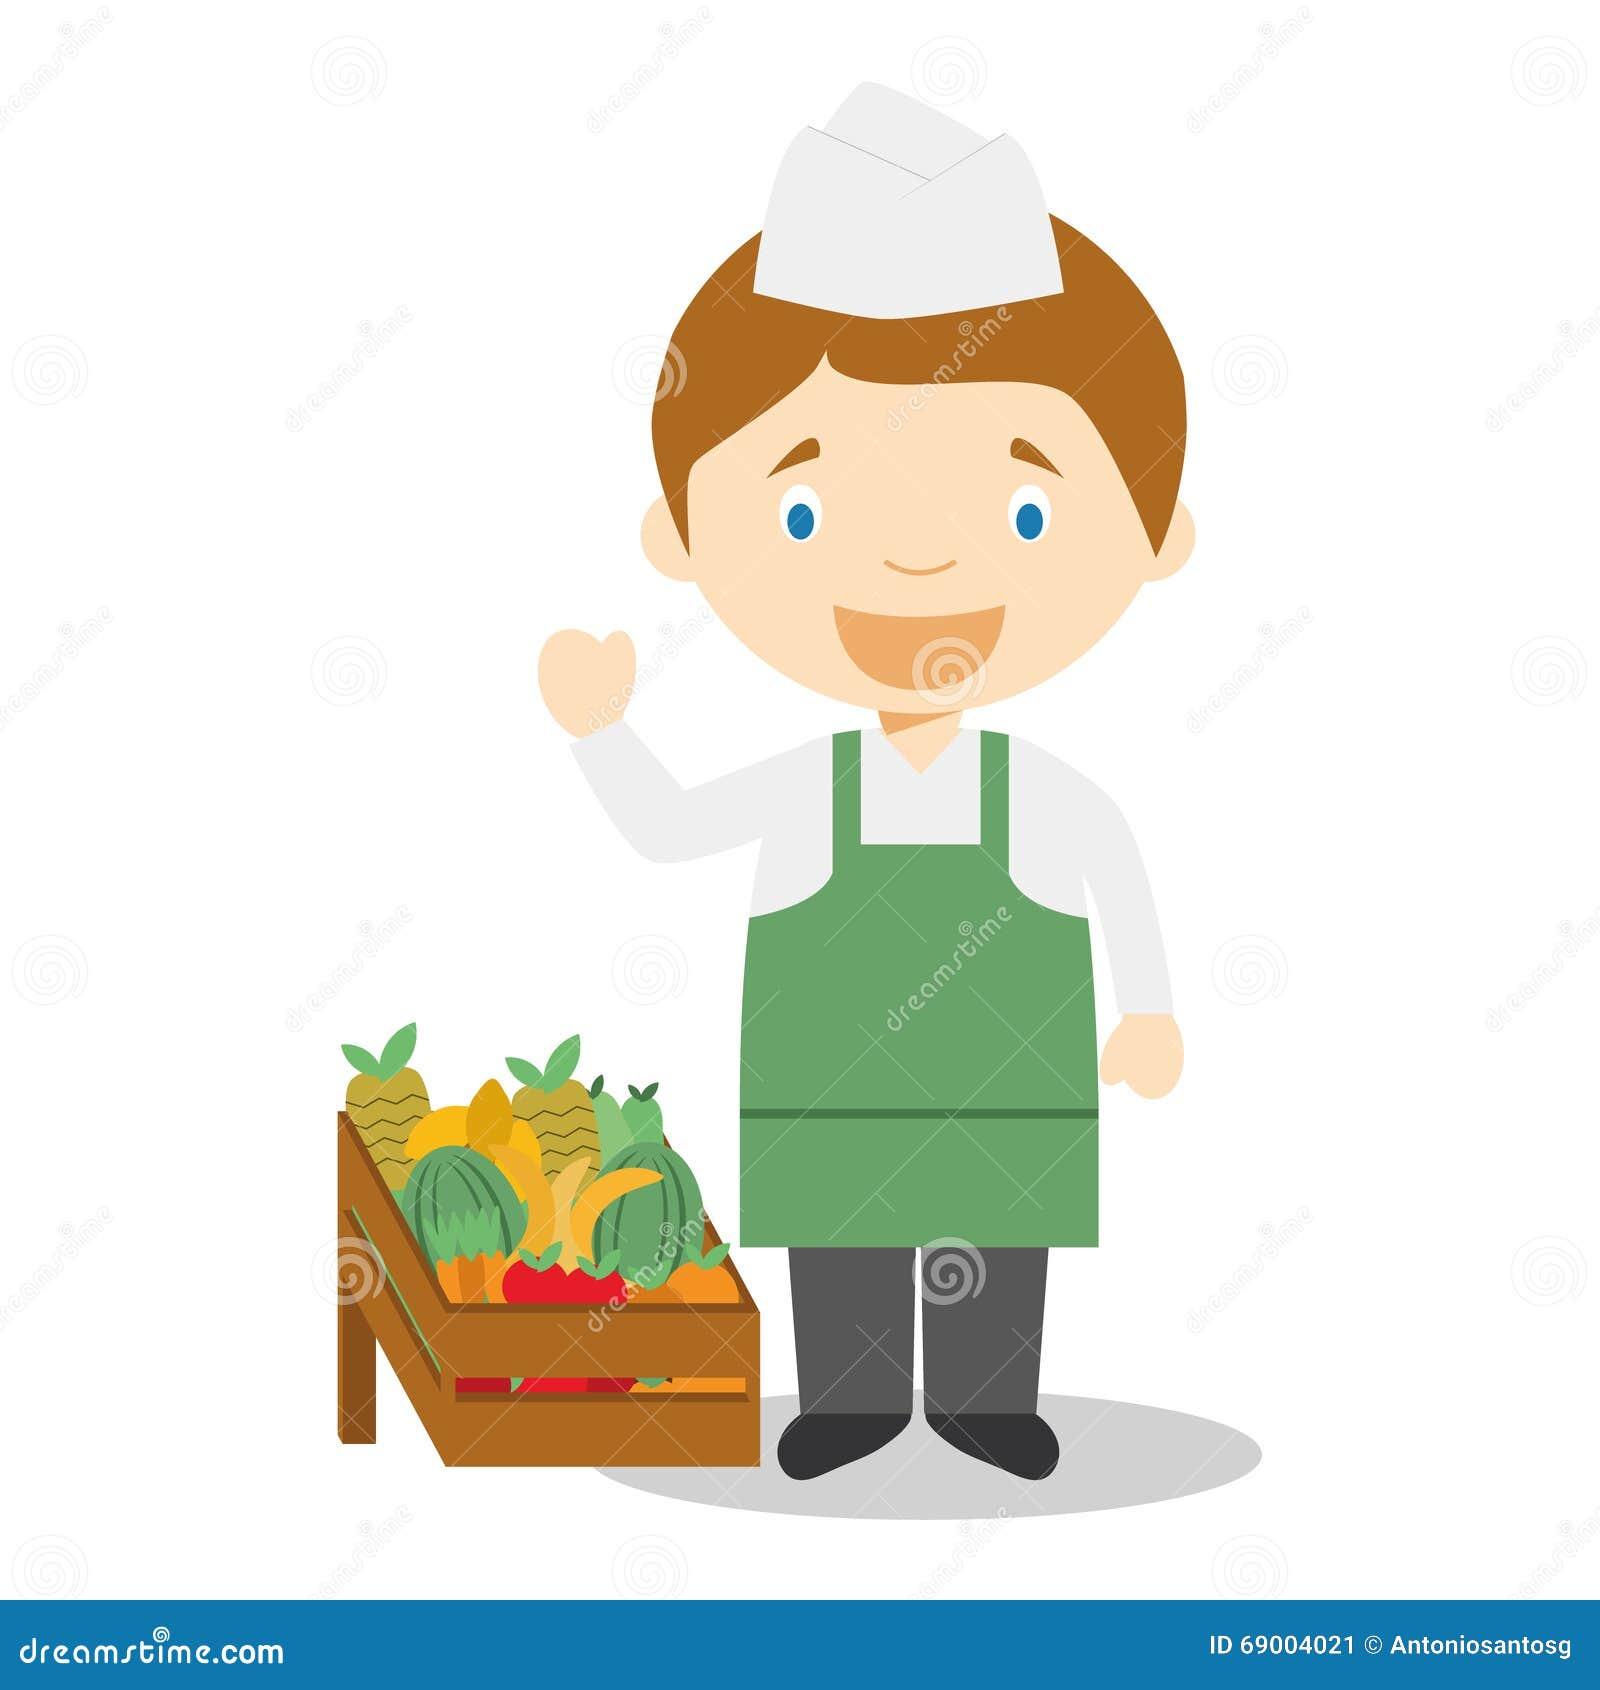 cute cartoon vector illustration of a fruit seller stock vector